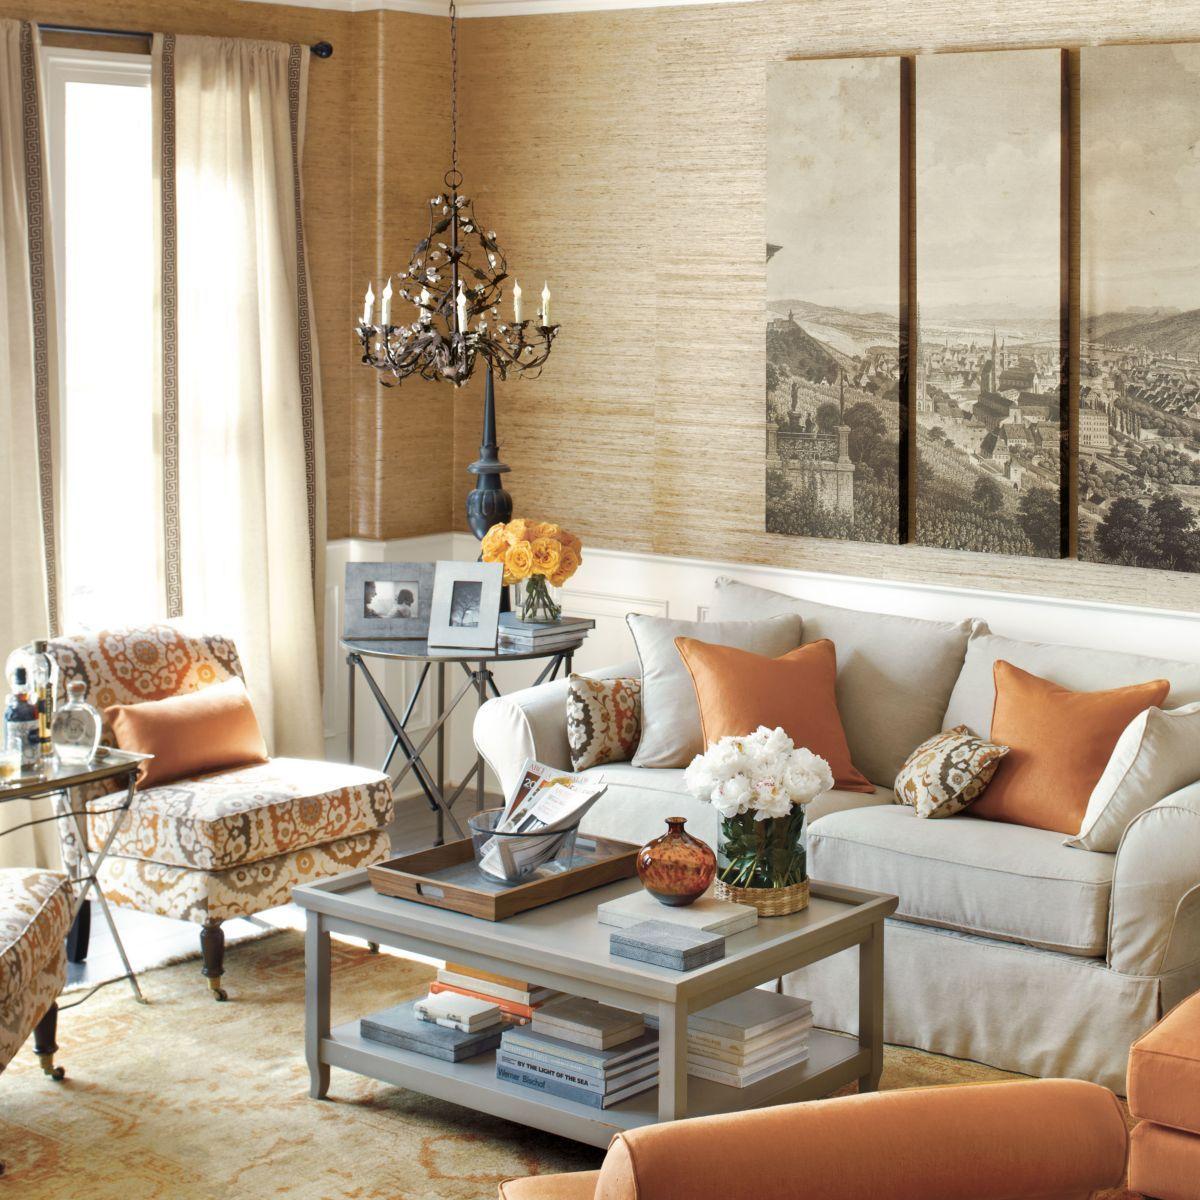 Living Room Furniture | Living Room Decor | Ballard ...